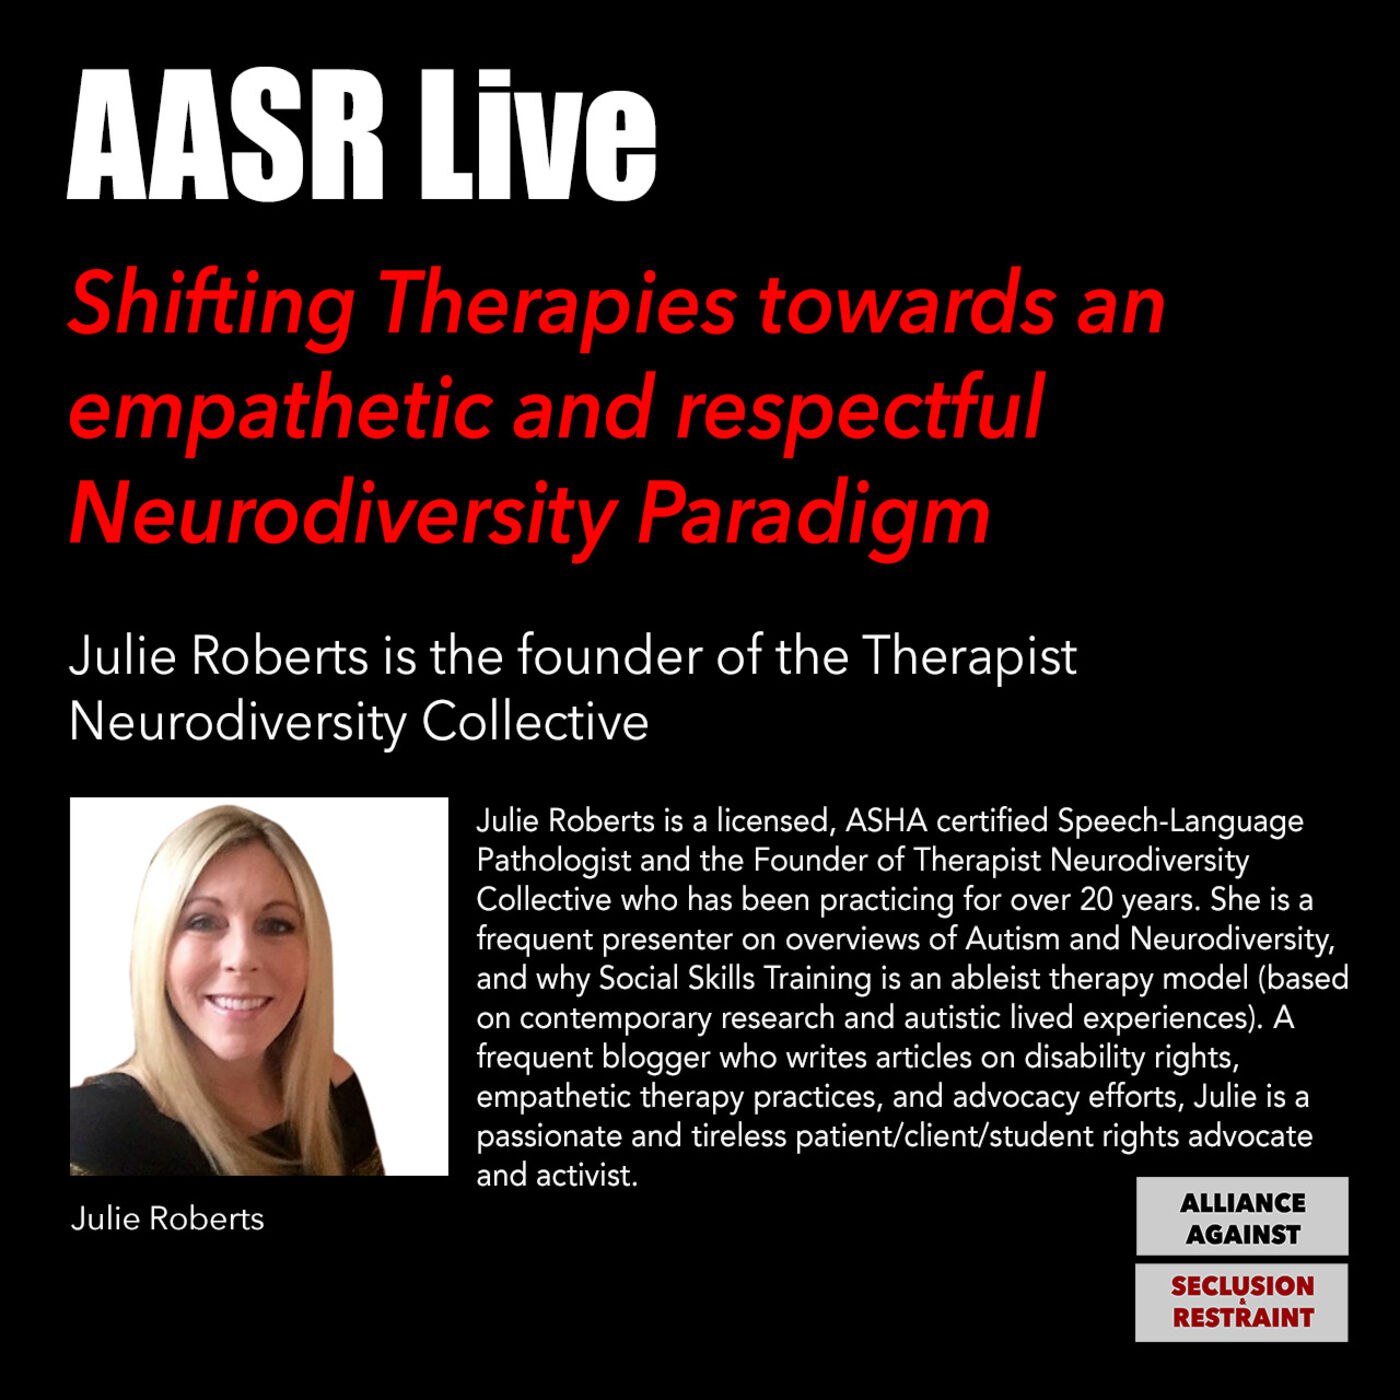 Shifting Therapies towards an empathetic and respectful Neurodiversity Paradigm